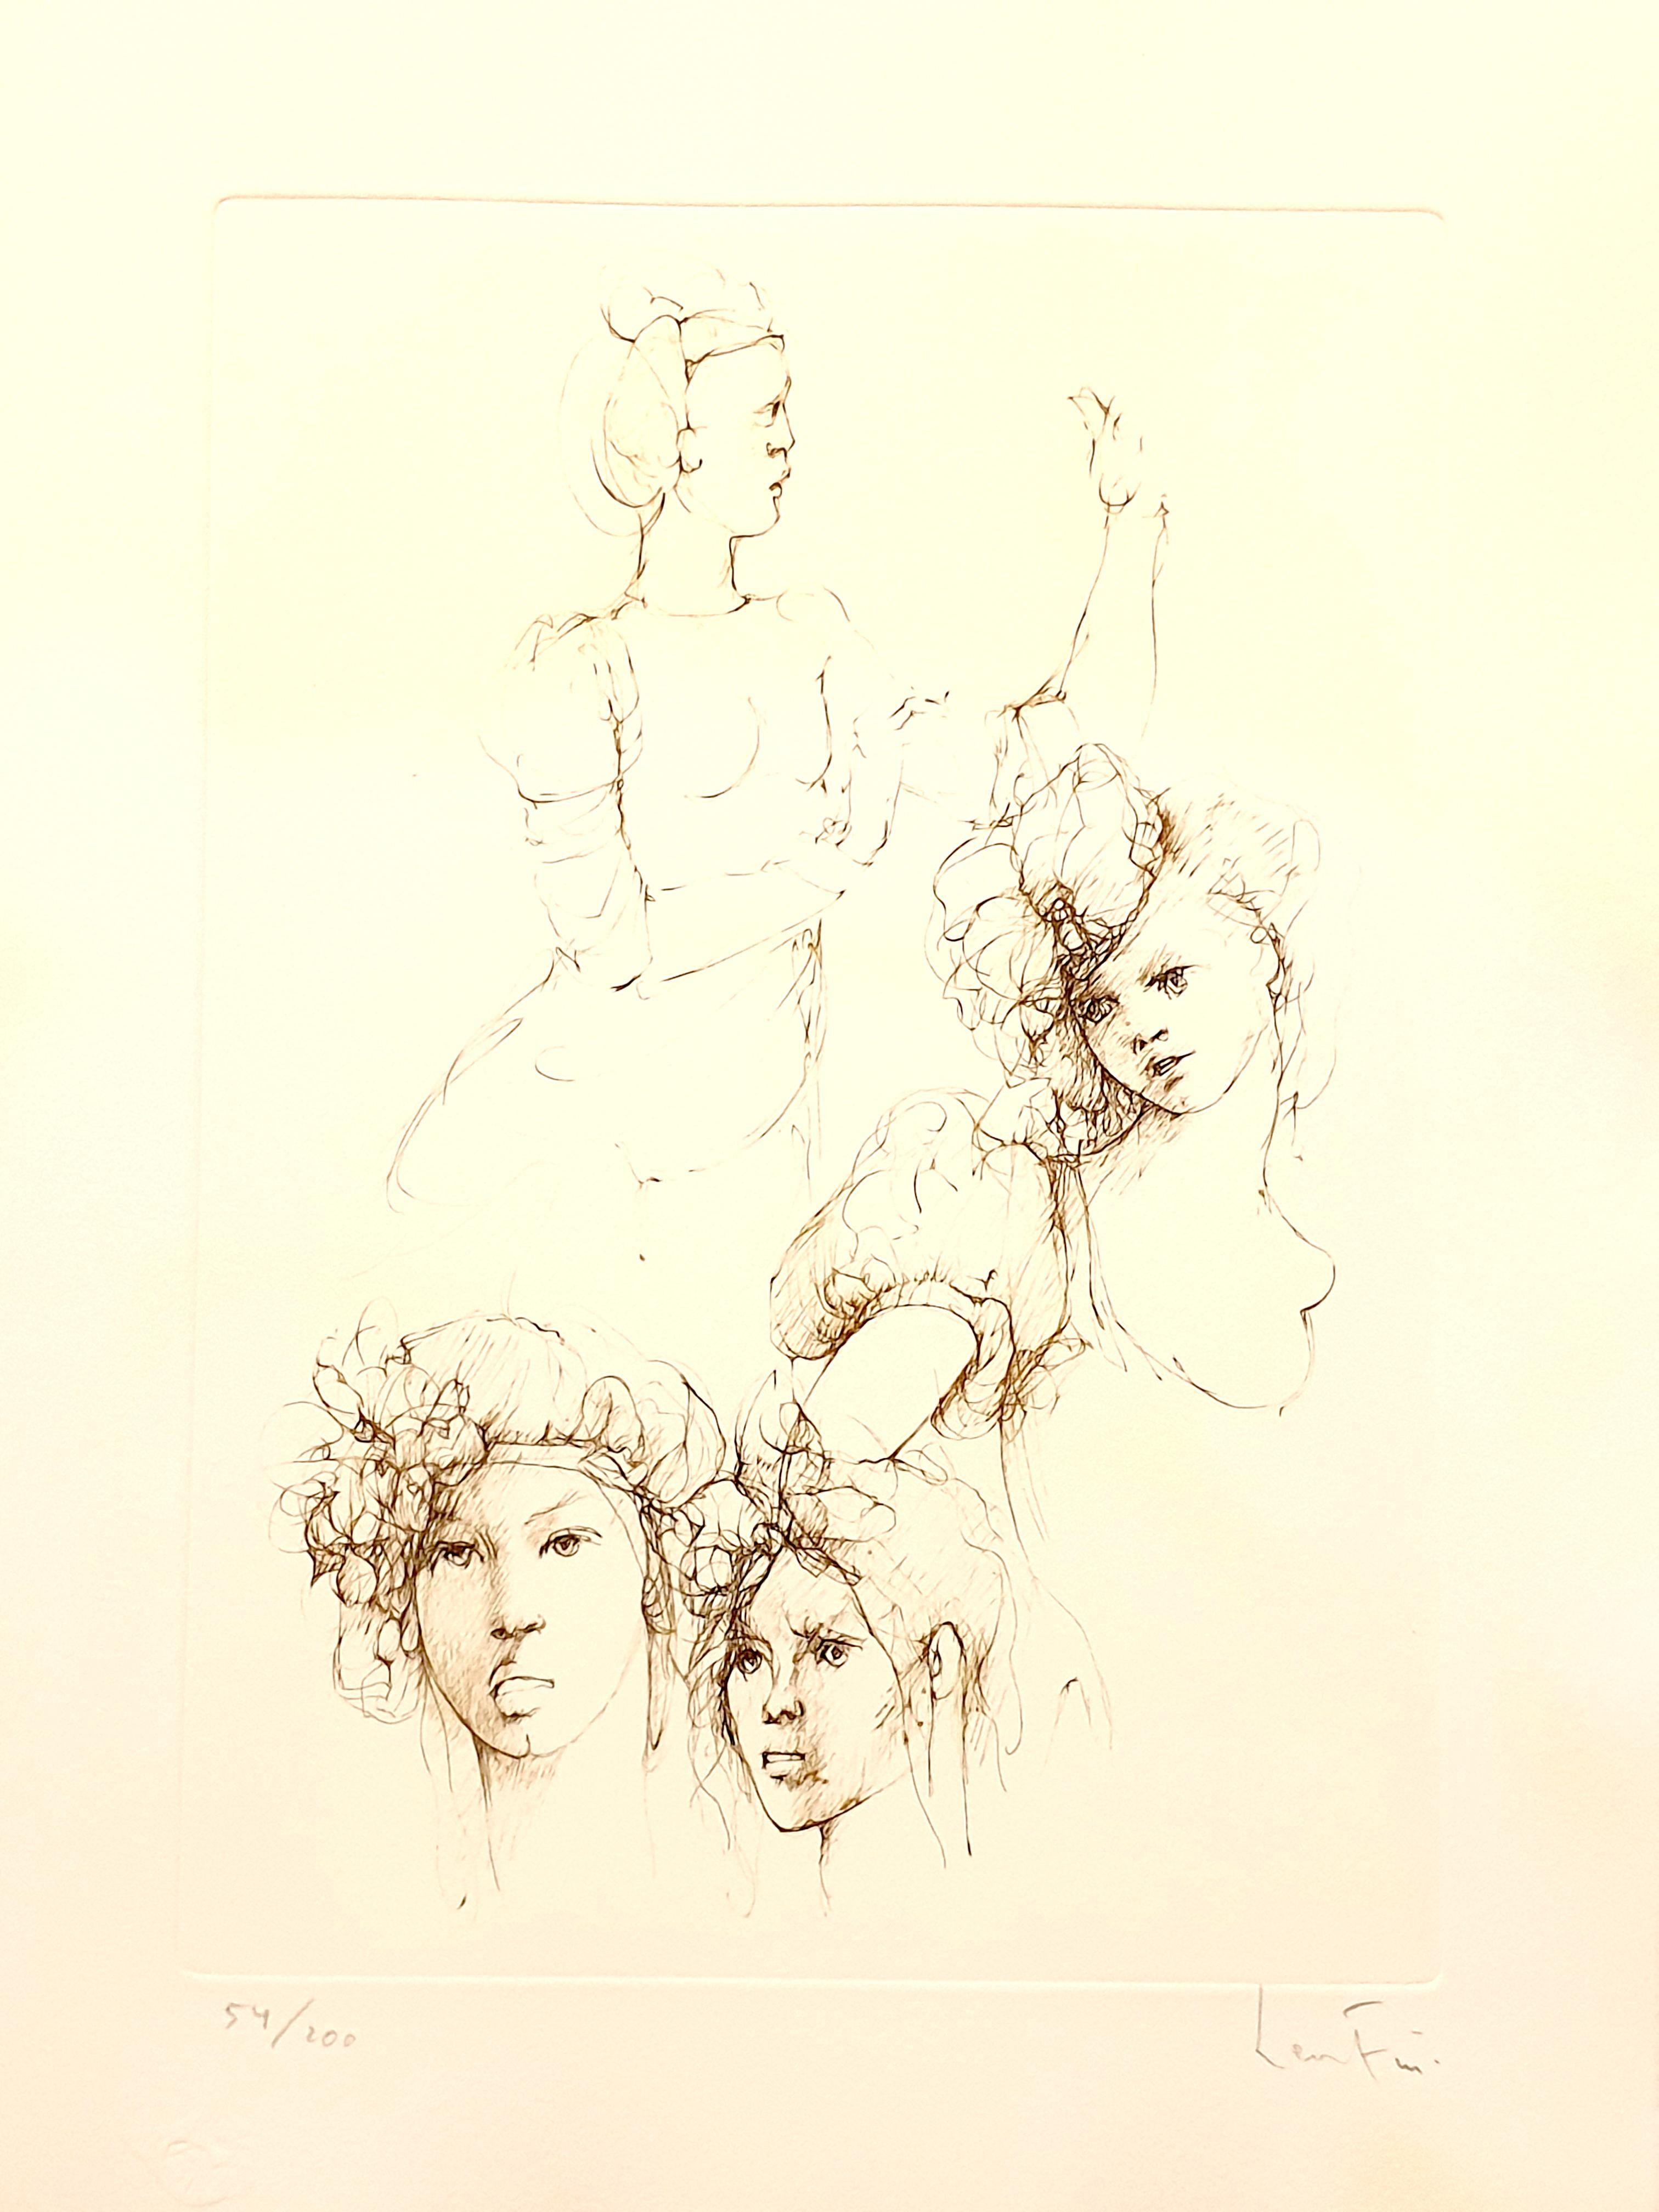 Leonor Fini - Portraits - Original Handsigned Lithograph